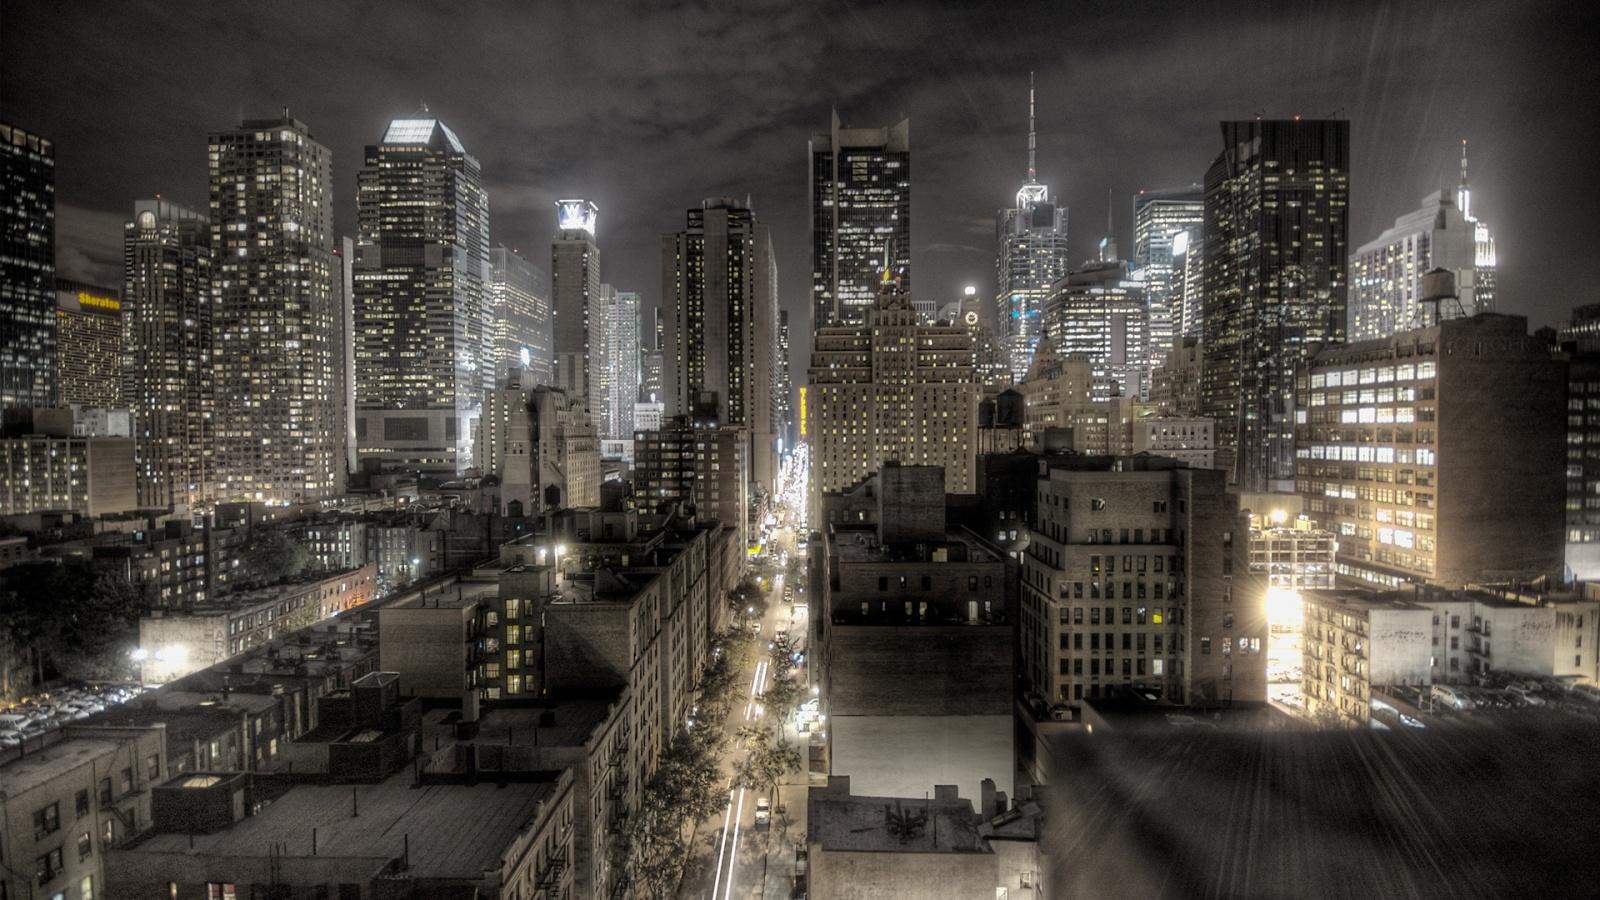 Dark Newyork city Wallpapers HD Wallpapers 1600x900